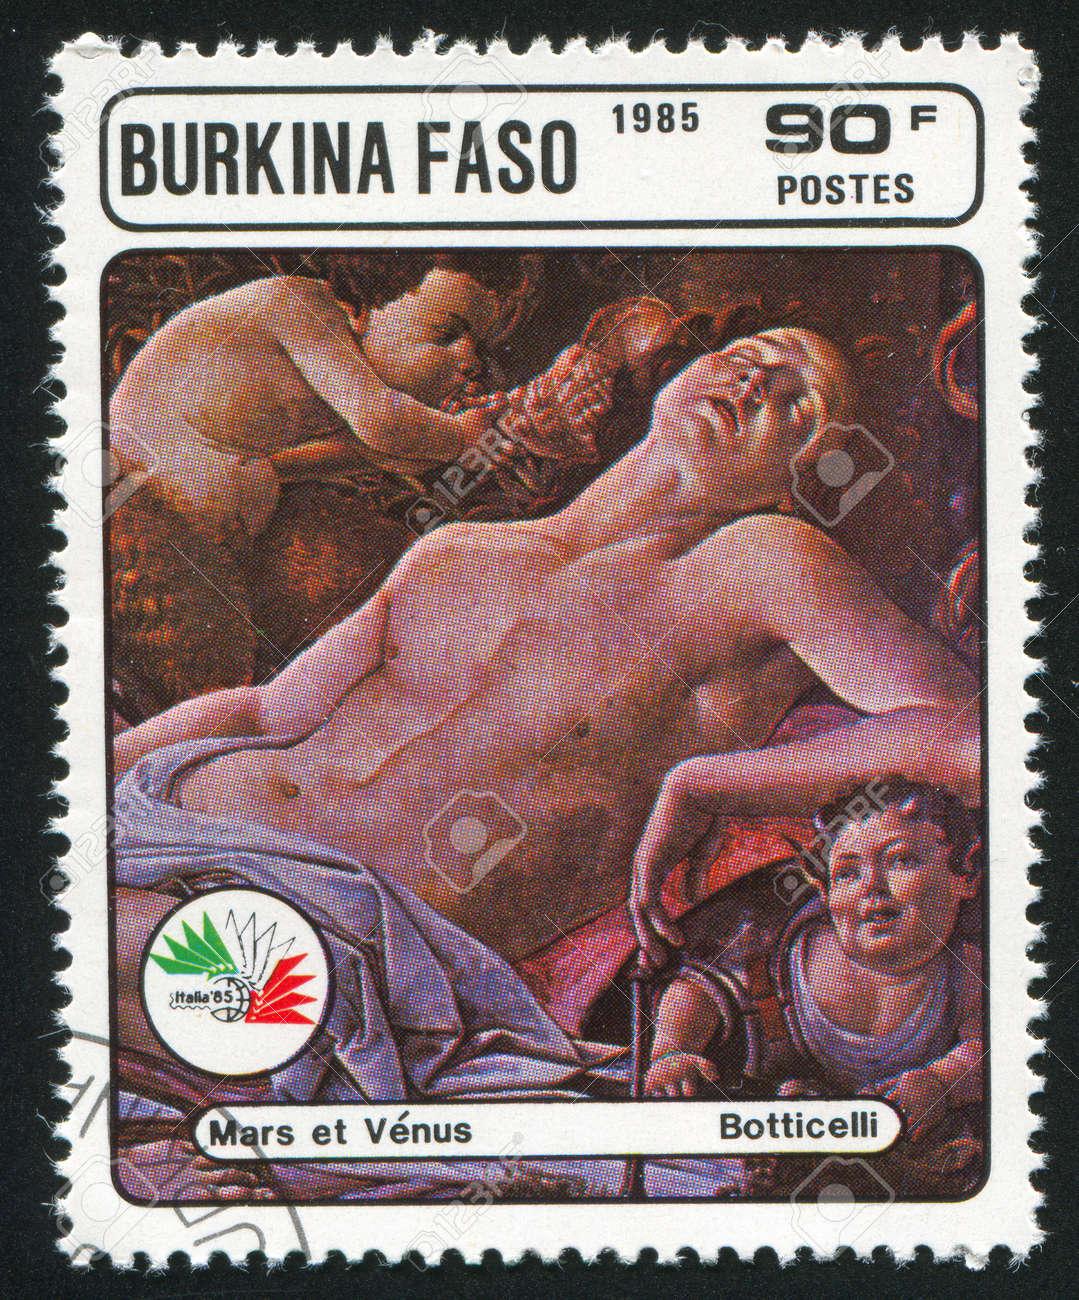 BURKINA FASO CIRCA 1985: stamp printed by Burkina Faso, shows Mars and Venus, Botticelli, circa 1985 Stock Photo - 10892202